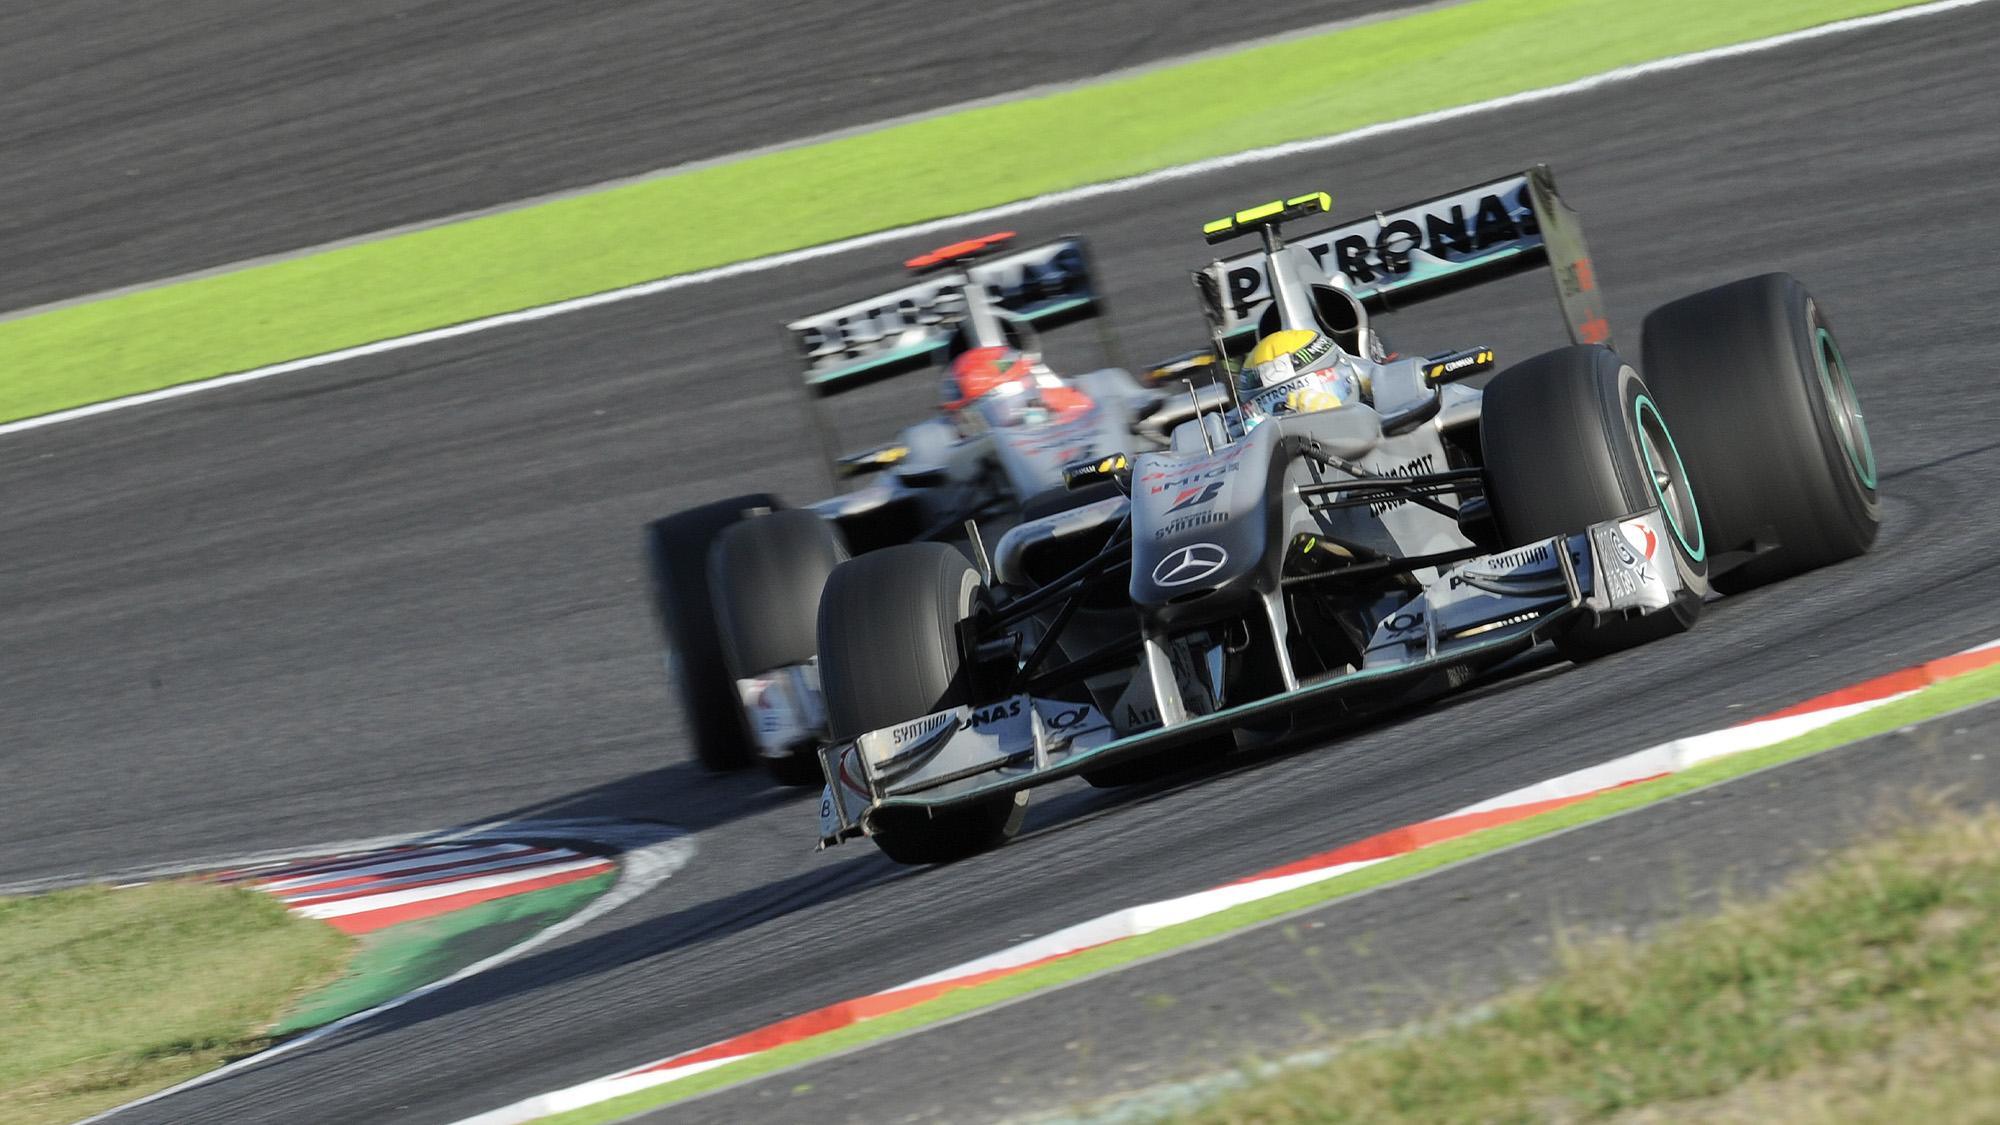 Nico Rosberg leads Mercedes team-mate Michael Schumacher at Suzuka in the 2010 Japanese Grand Prix